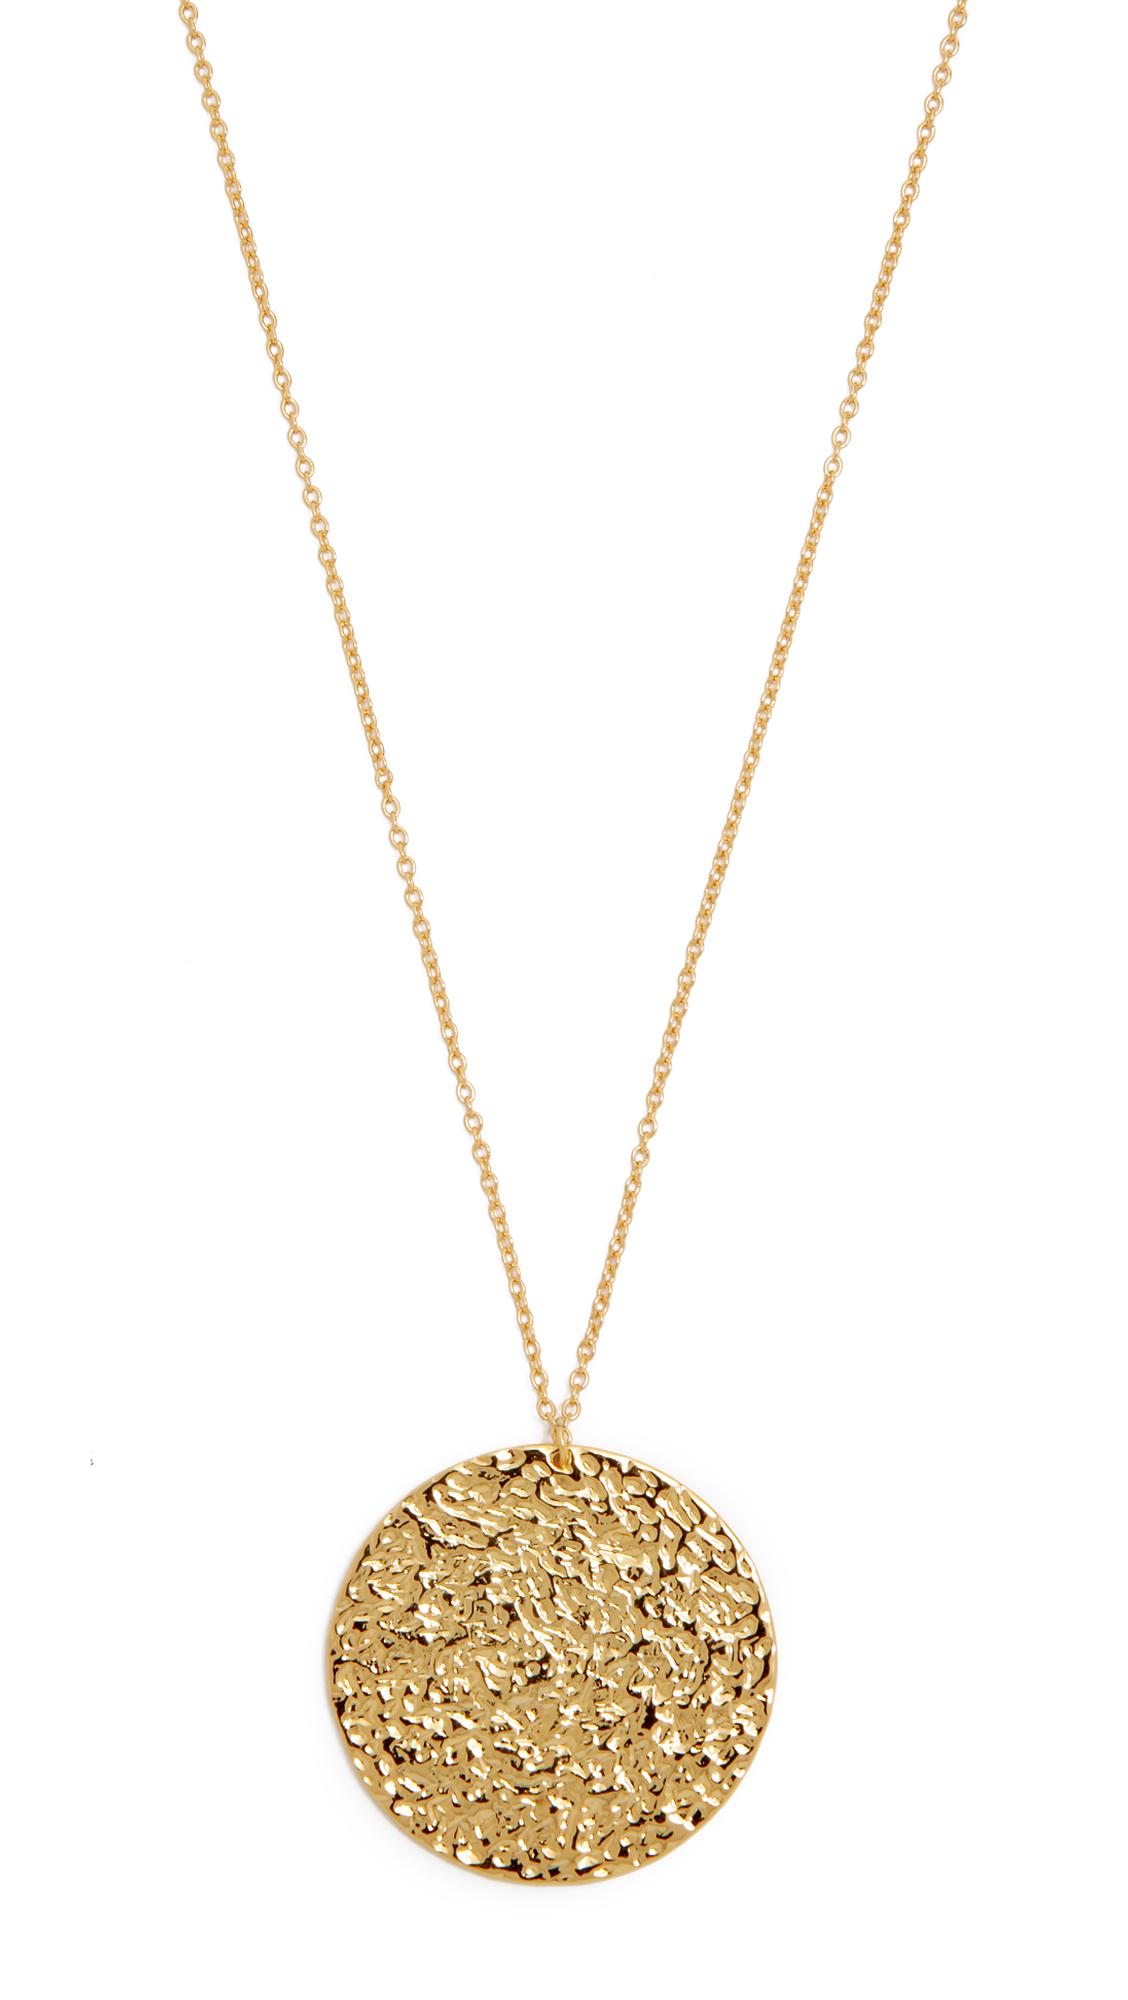 Gorjana Faye Necklace in Metallic Gold PtvgWdUjtF